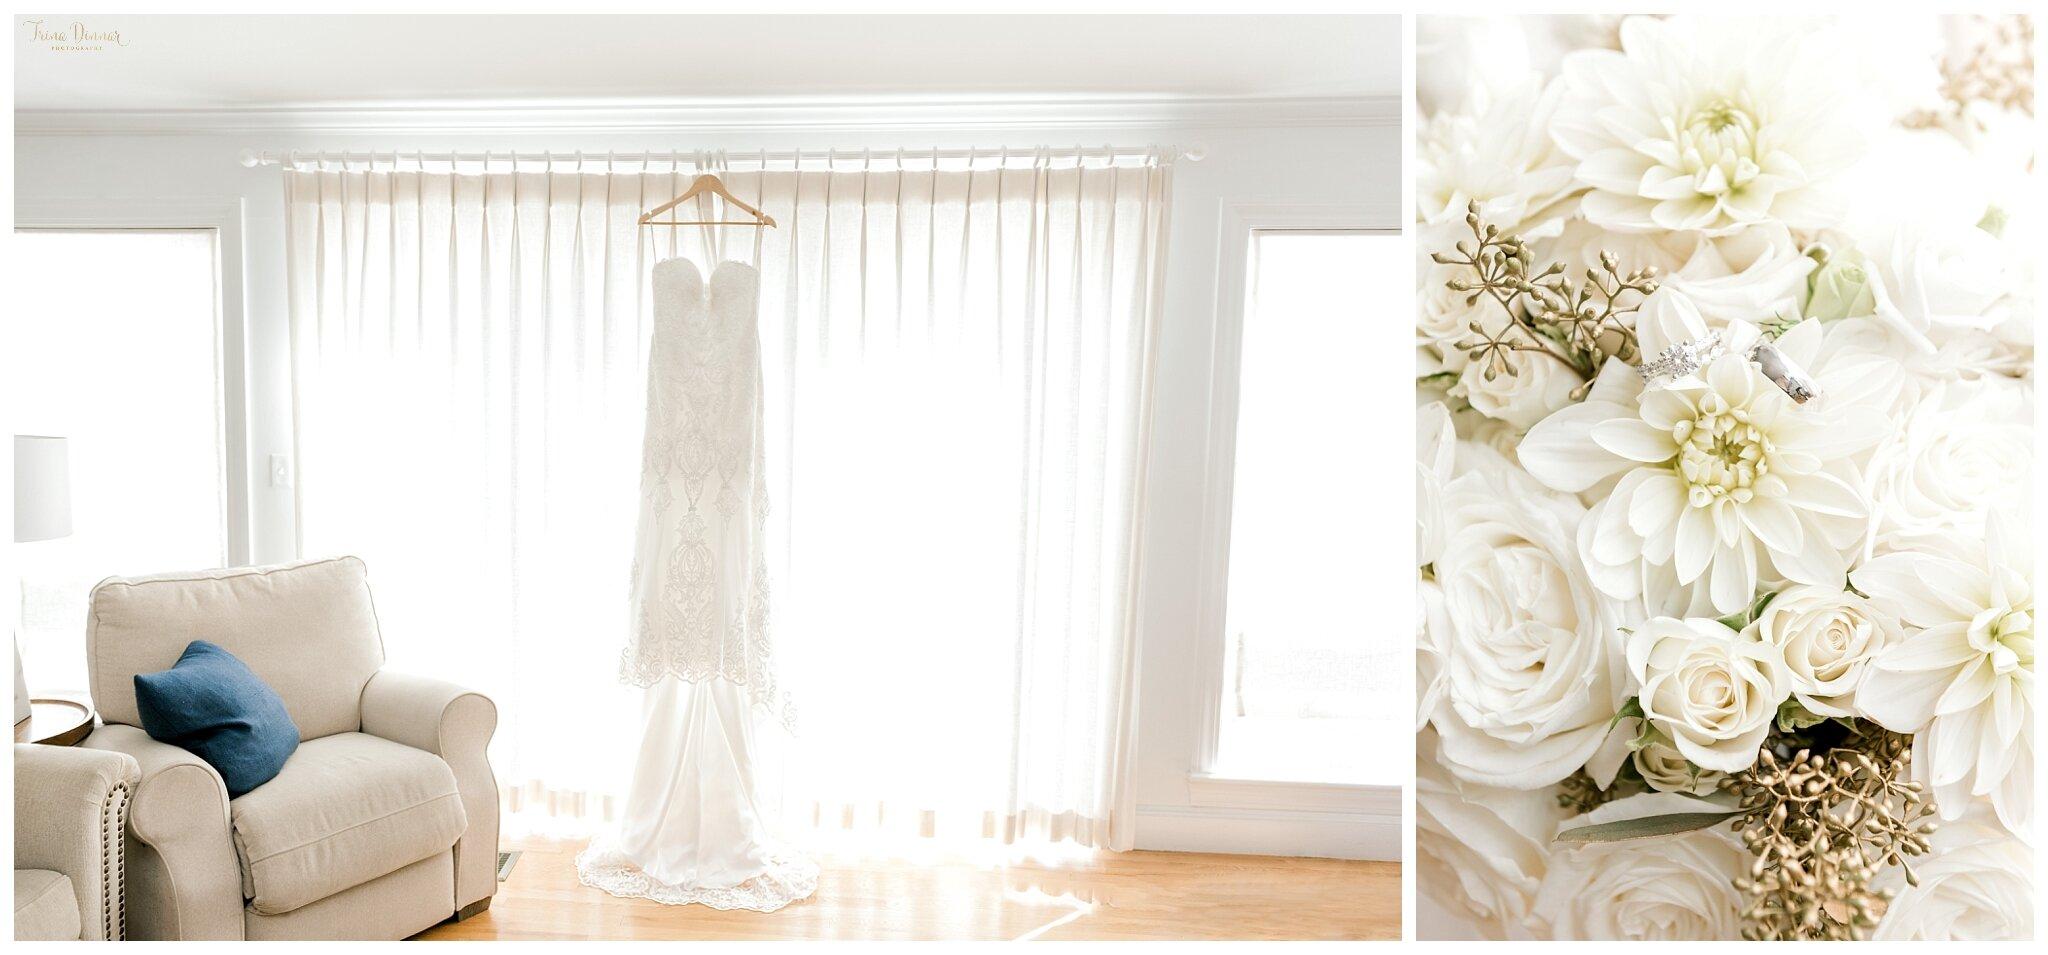 Andrea's Bridal Portland, Maine Wedding Gown